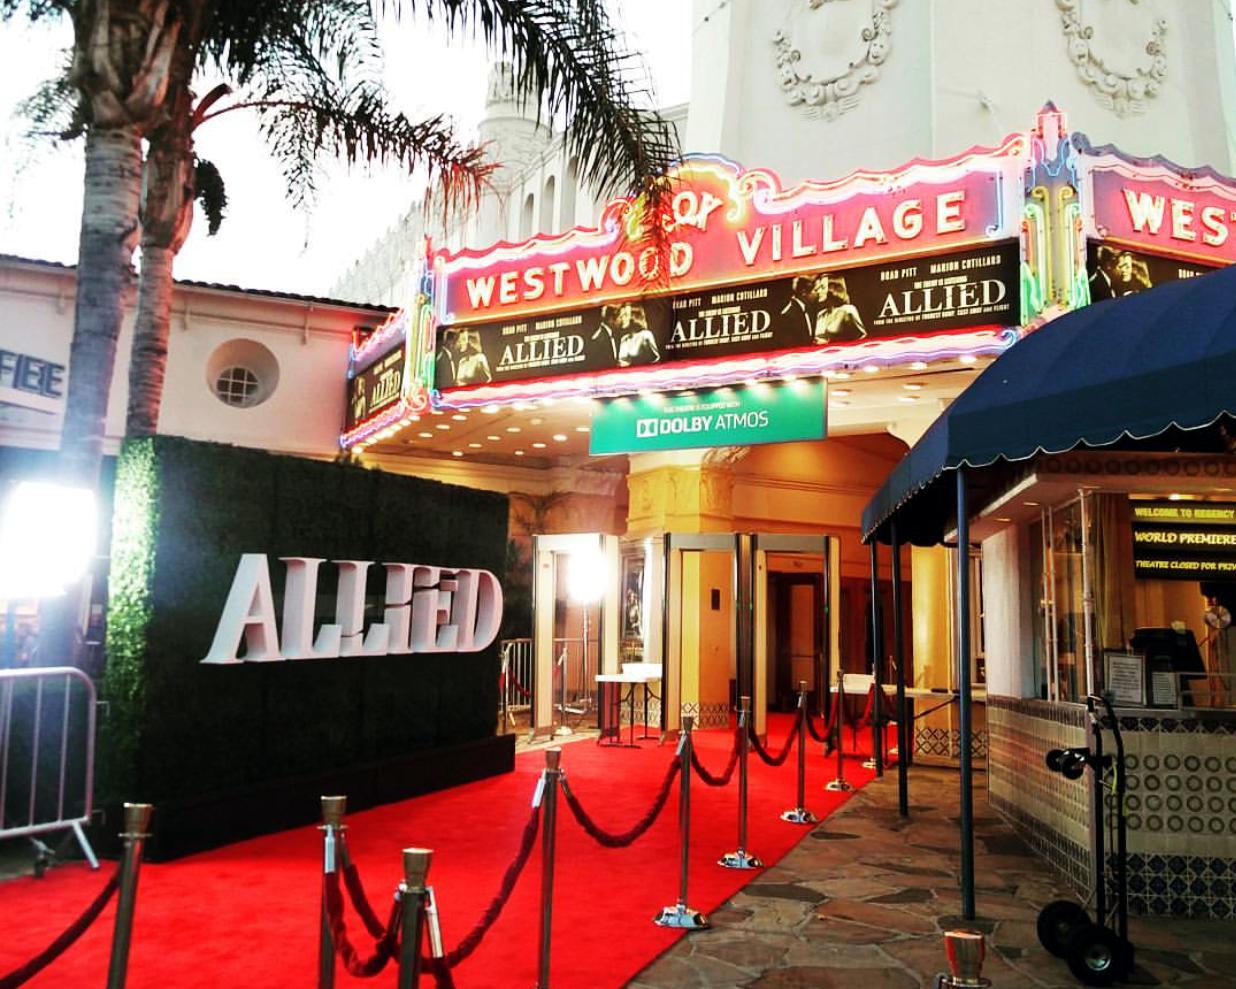 allied-movie-premiere-red-carpet-la